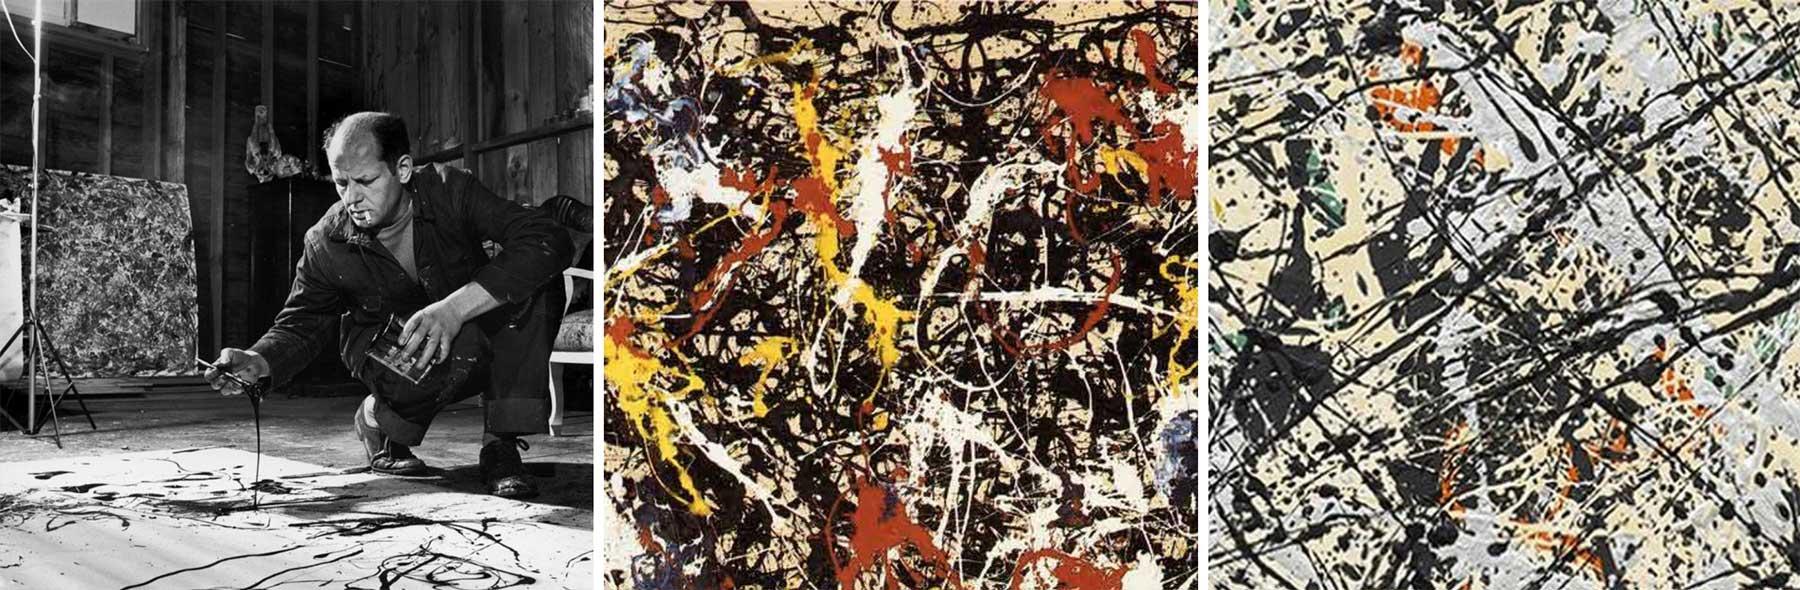 Wenn klassische Maler moderne Logos hätten if-painters-had-logos-Milton-Omena_19